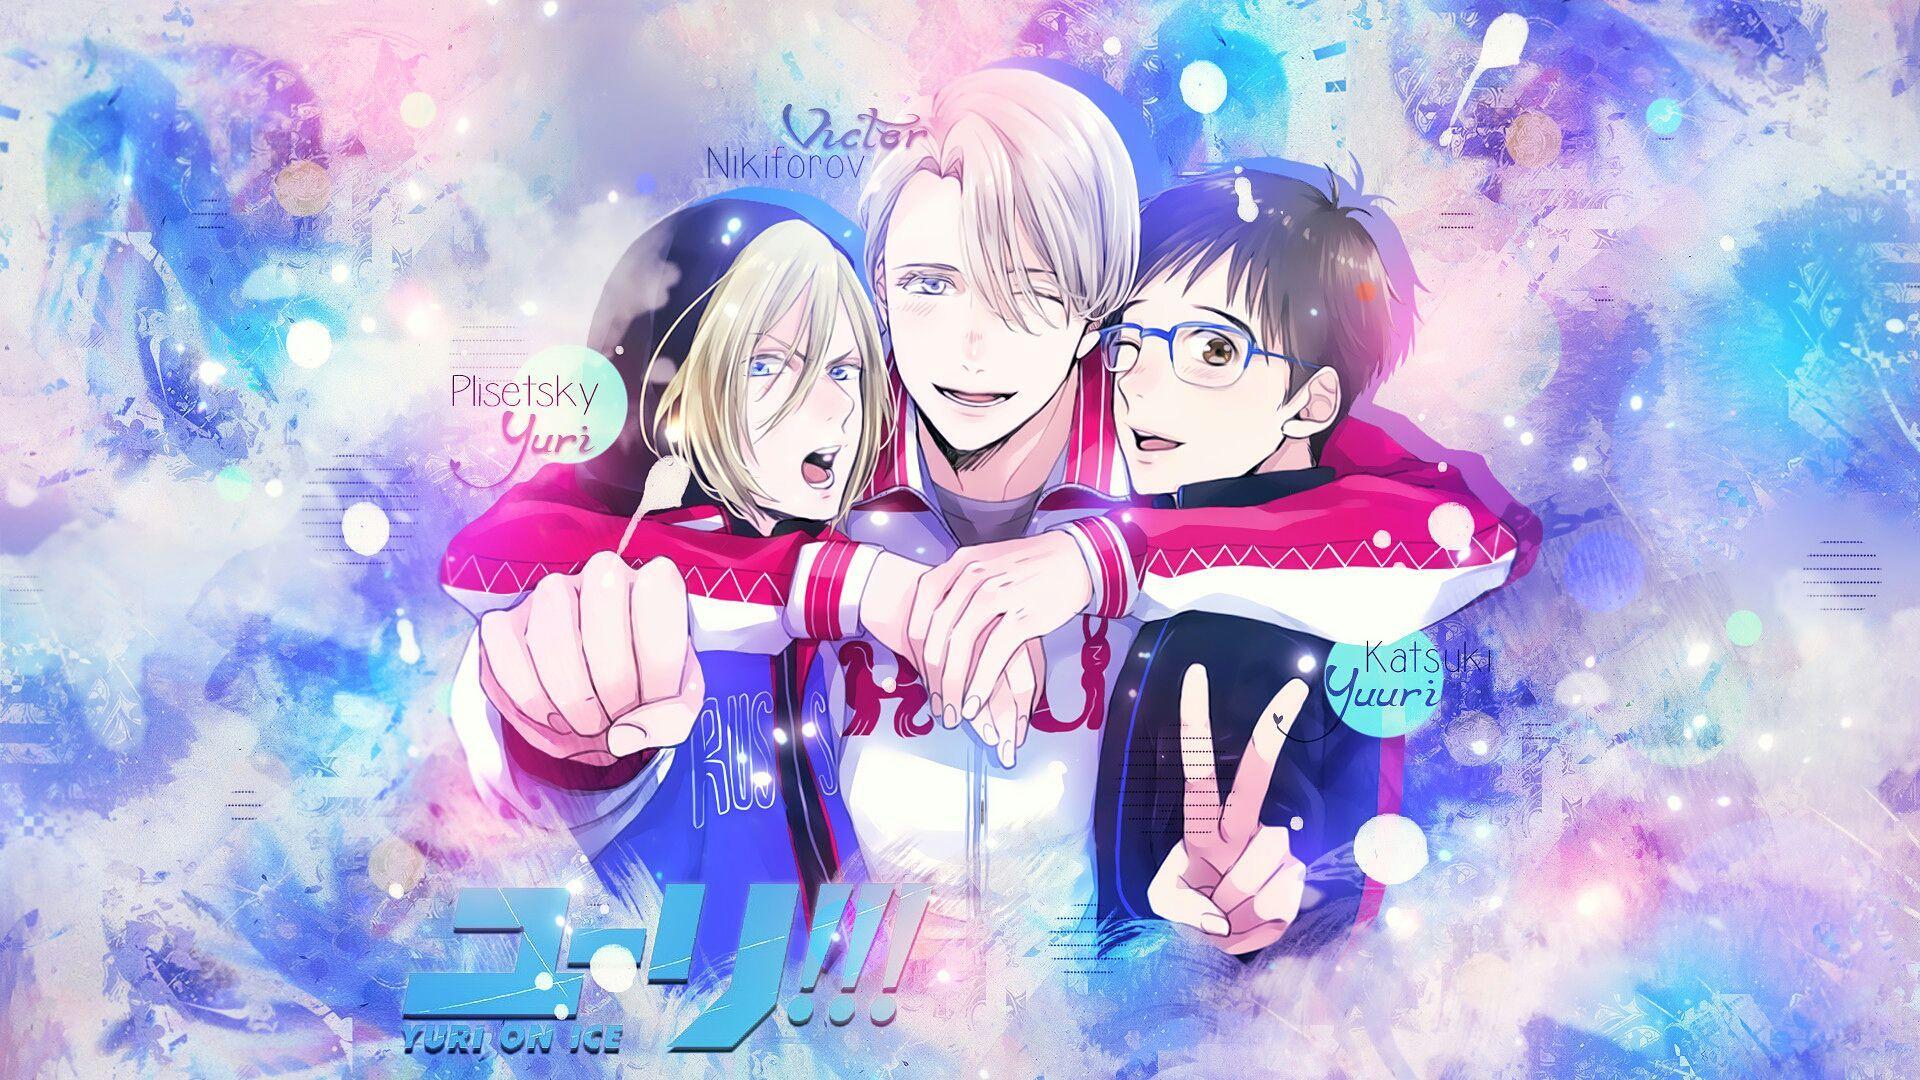 imagenes, memes o fondos de pantalla anime Yuri en hielo